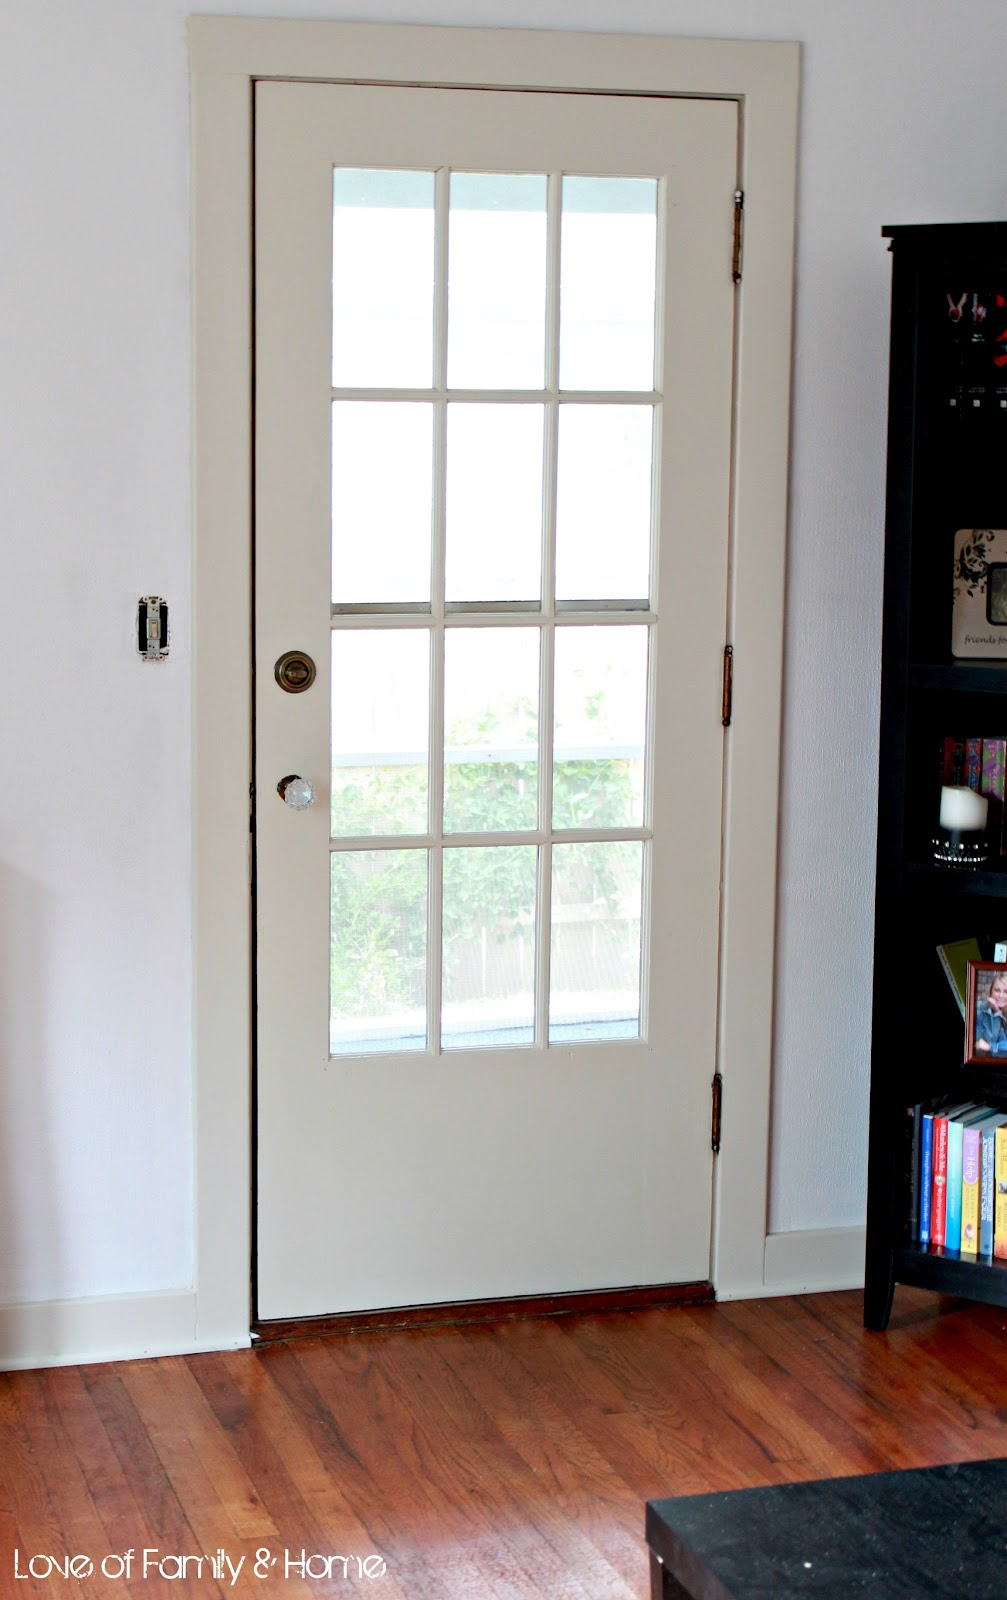 My Sister\'s House...Original Hardwood Floors & Beautiful Old Doors ...